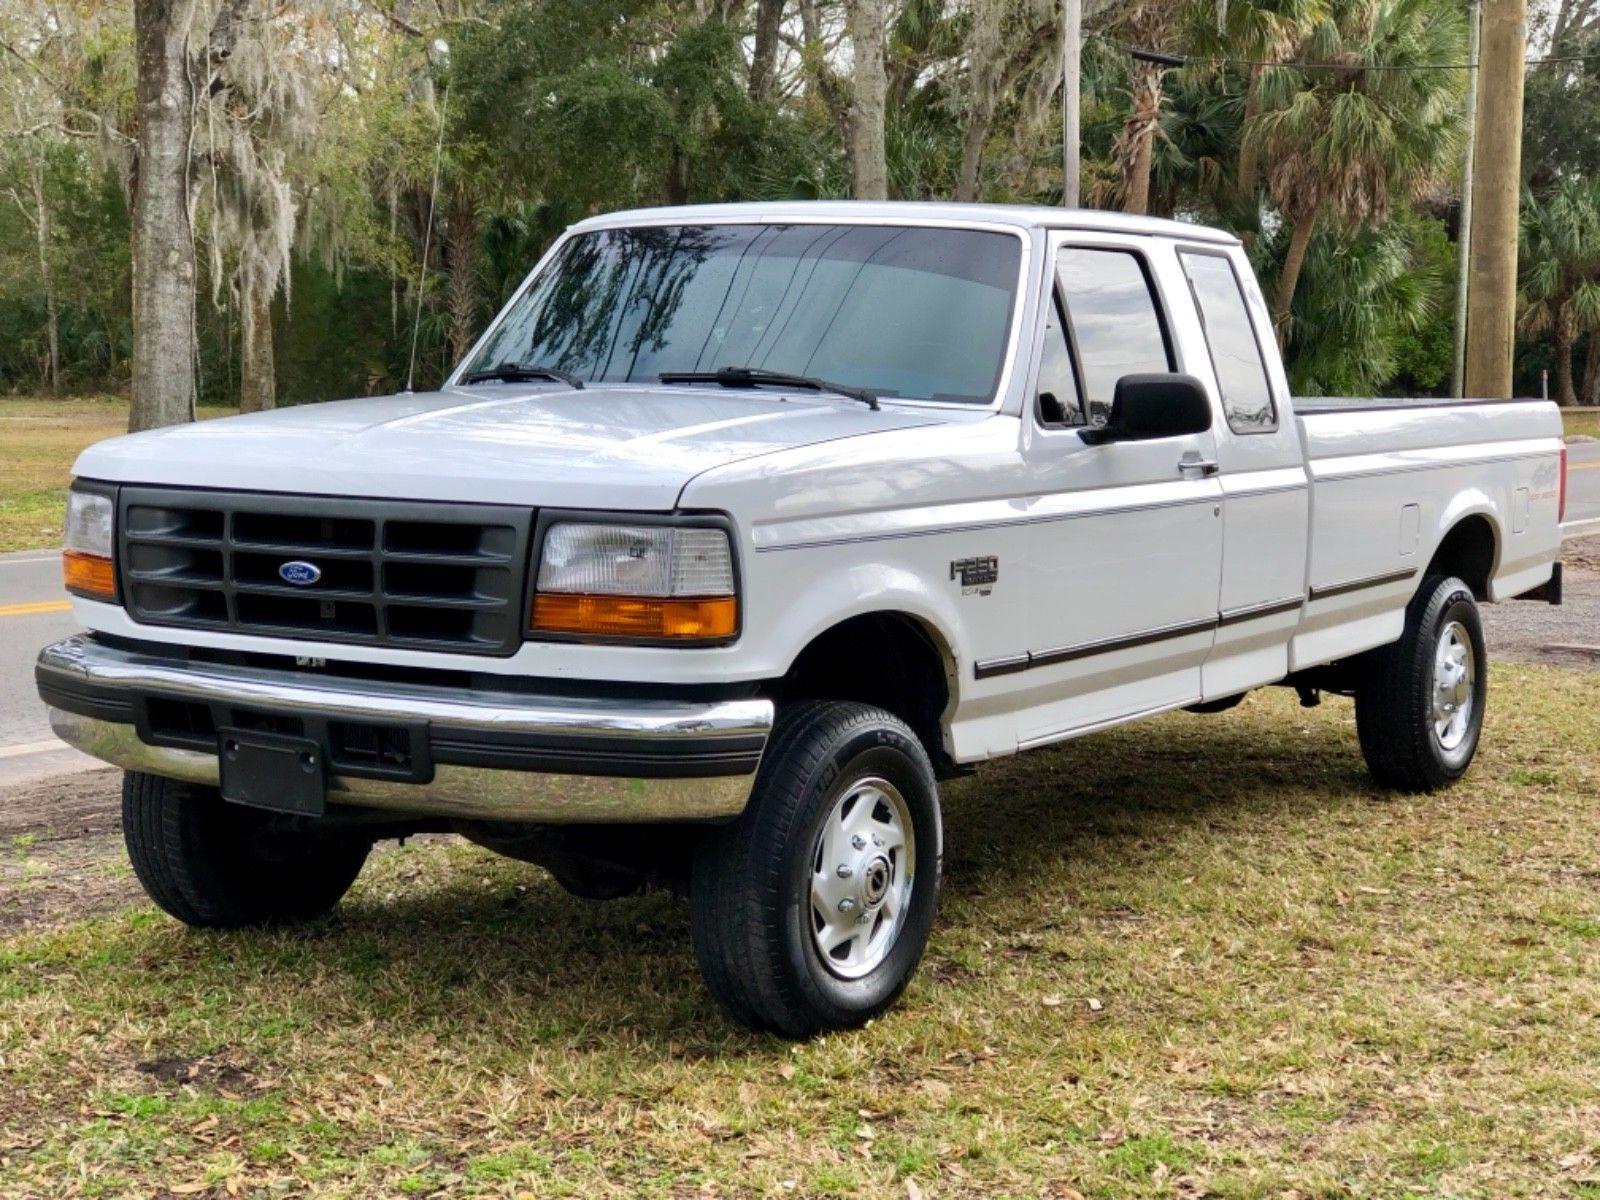 Nice Awesome 1997 Ford F 250 Xl 1997 F250 Ext Cab 4x4 126k 1996 1995 2017 2018 Ford Trucks F250 Cab